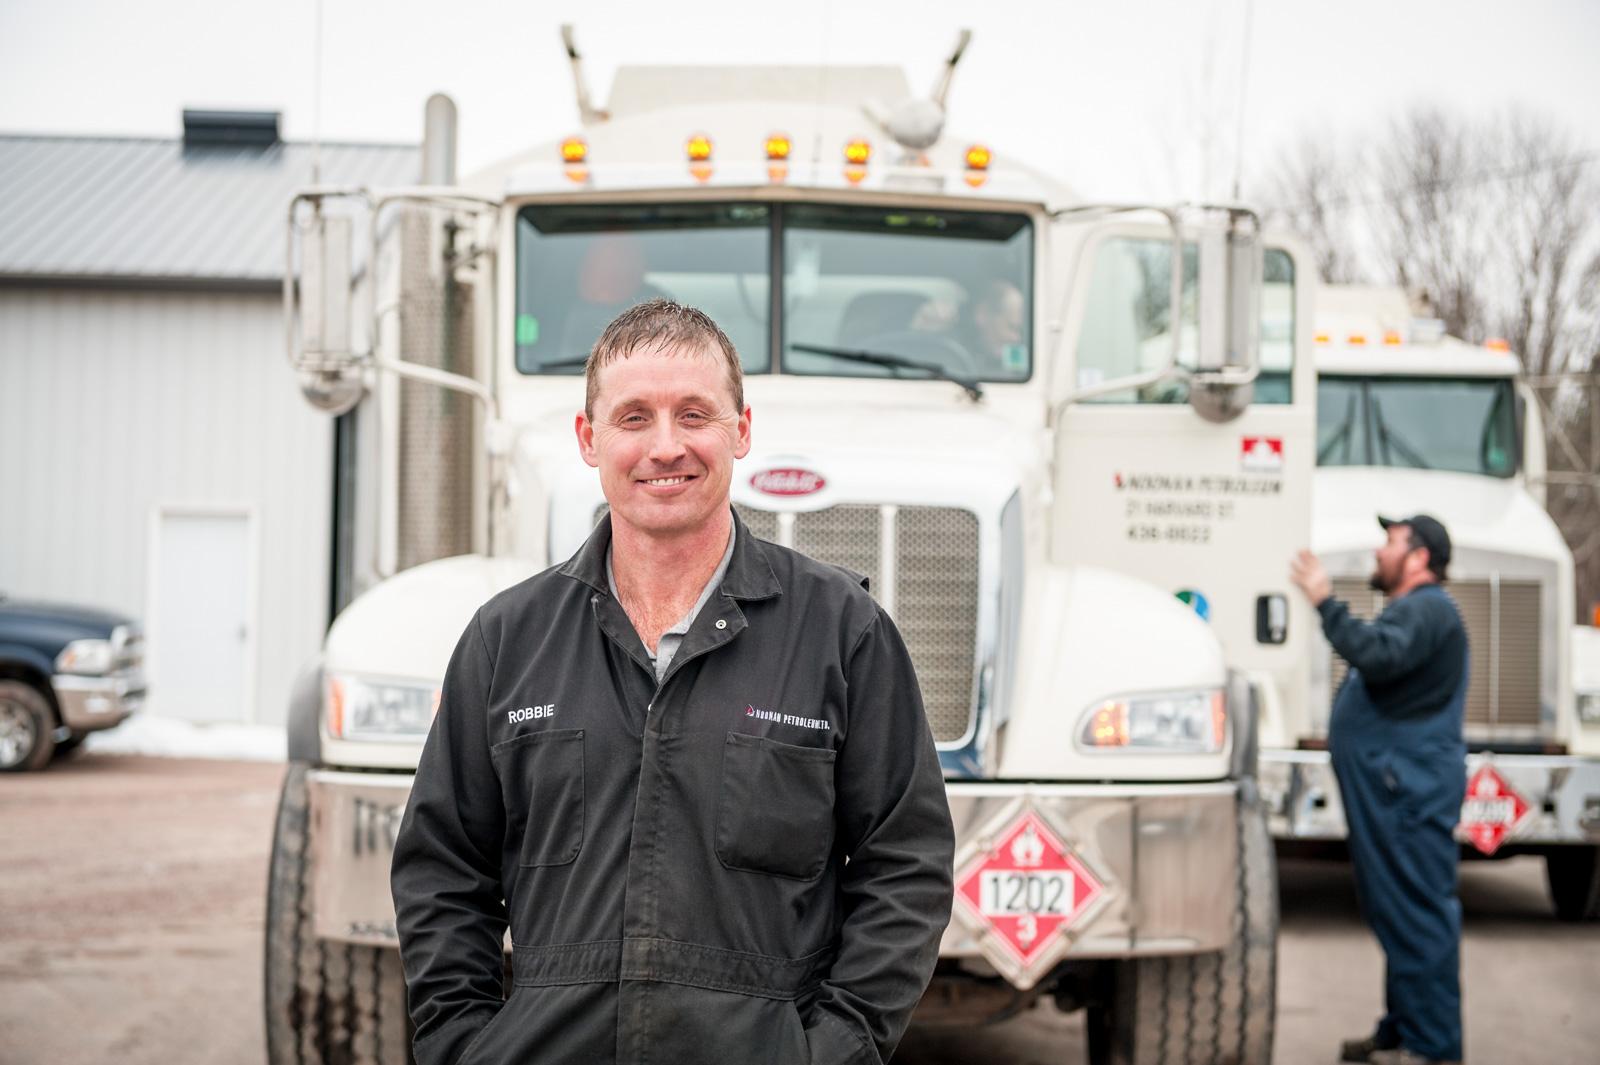 Robbie Dunbar, Driver